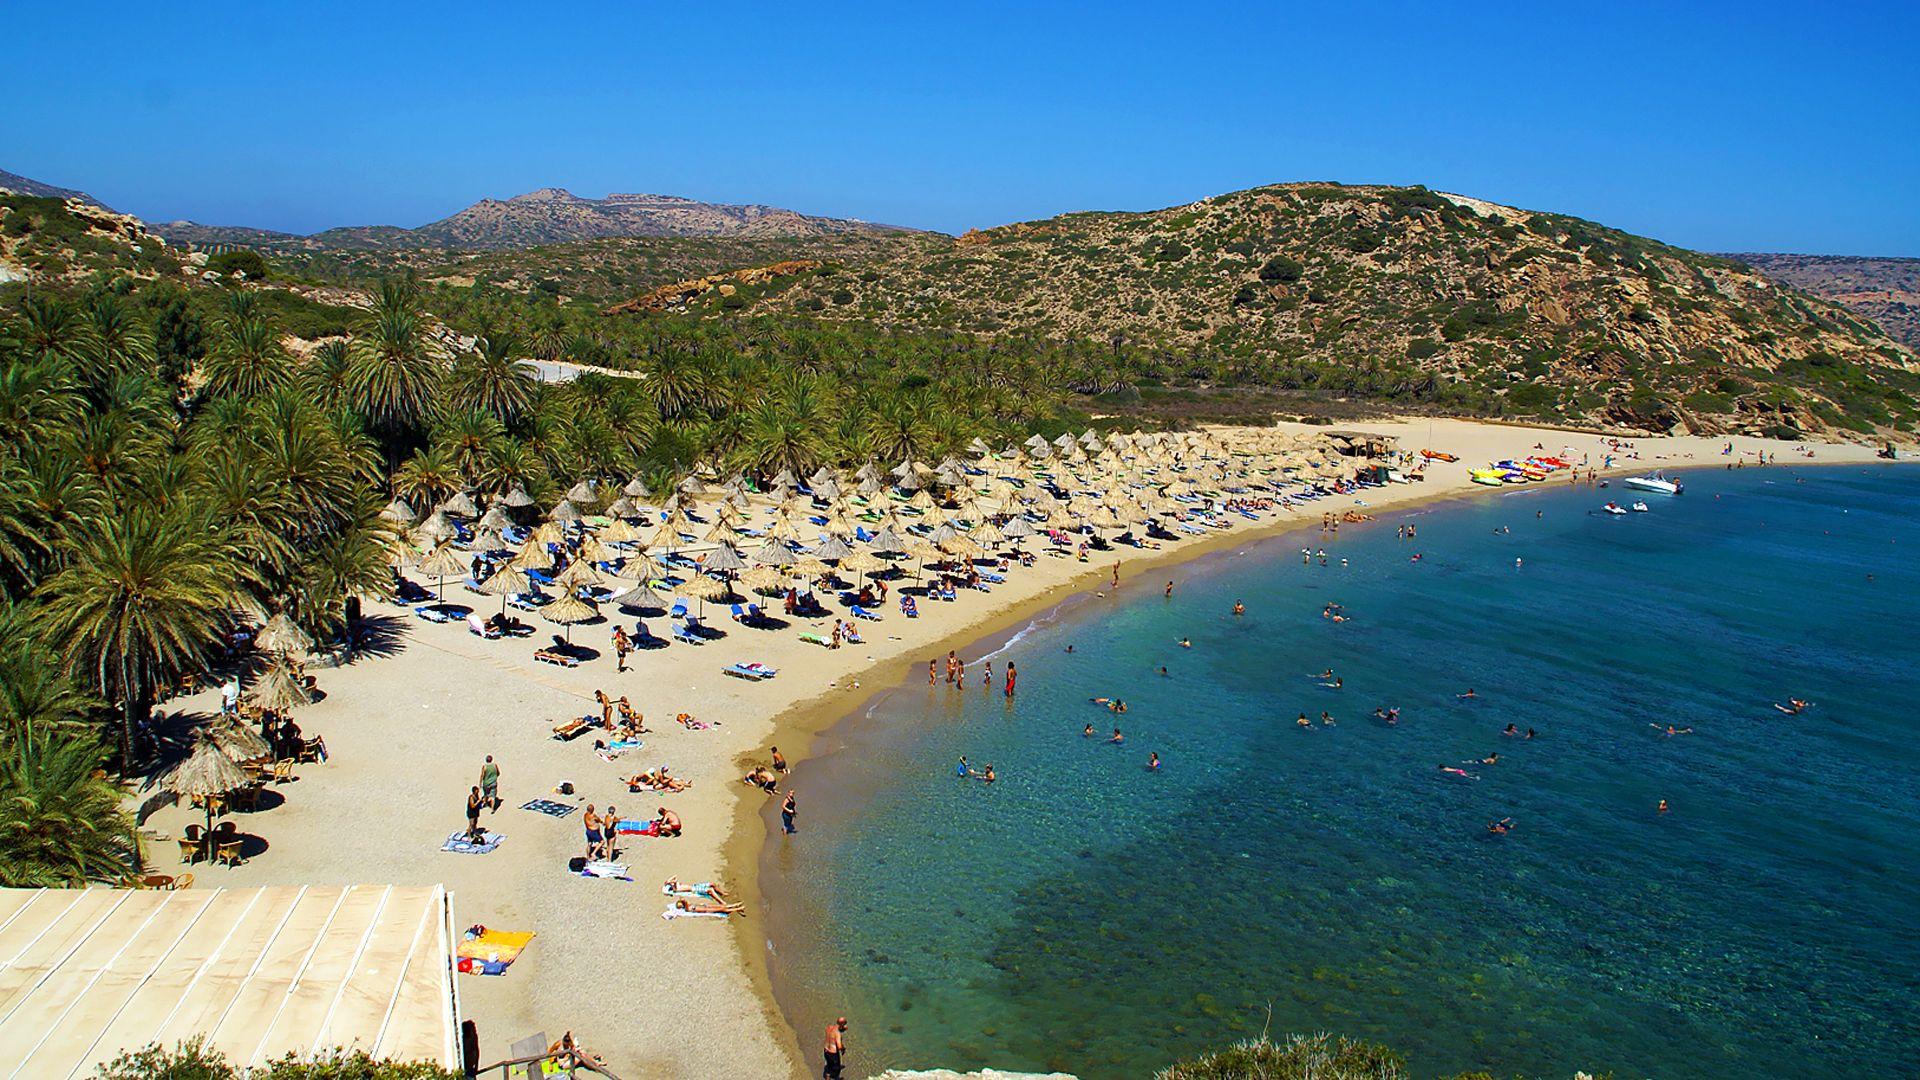 Plaja Vai (Vai Beach) - insula Creta